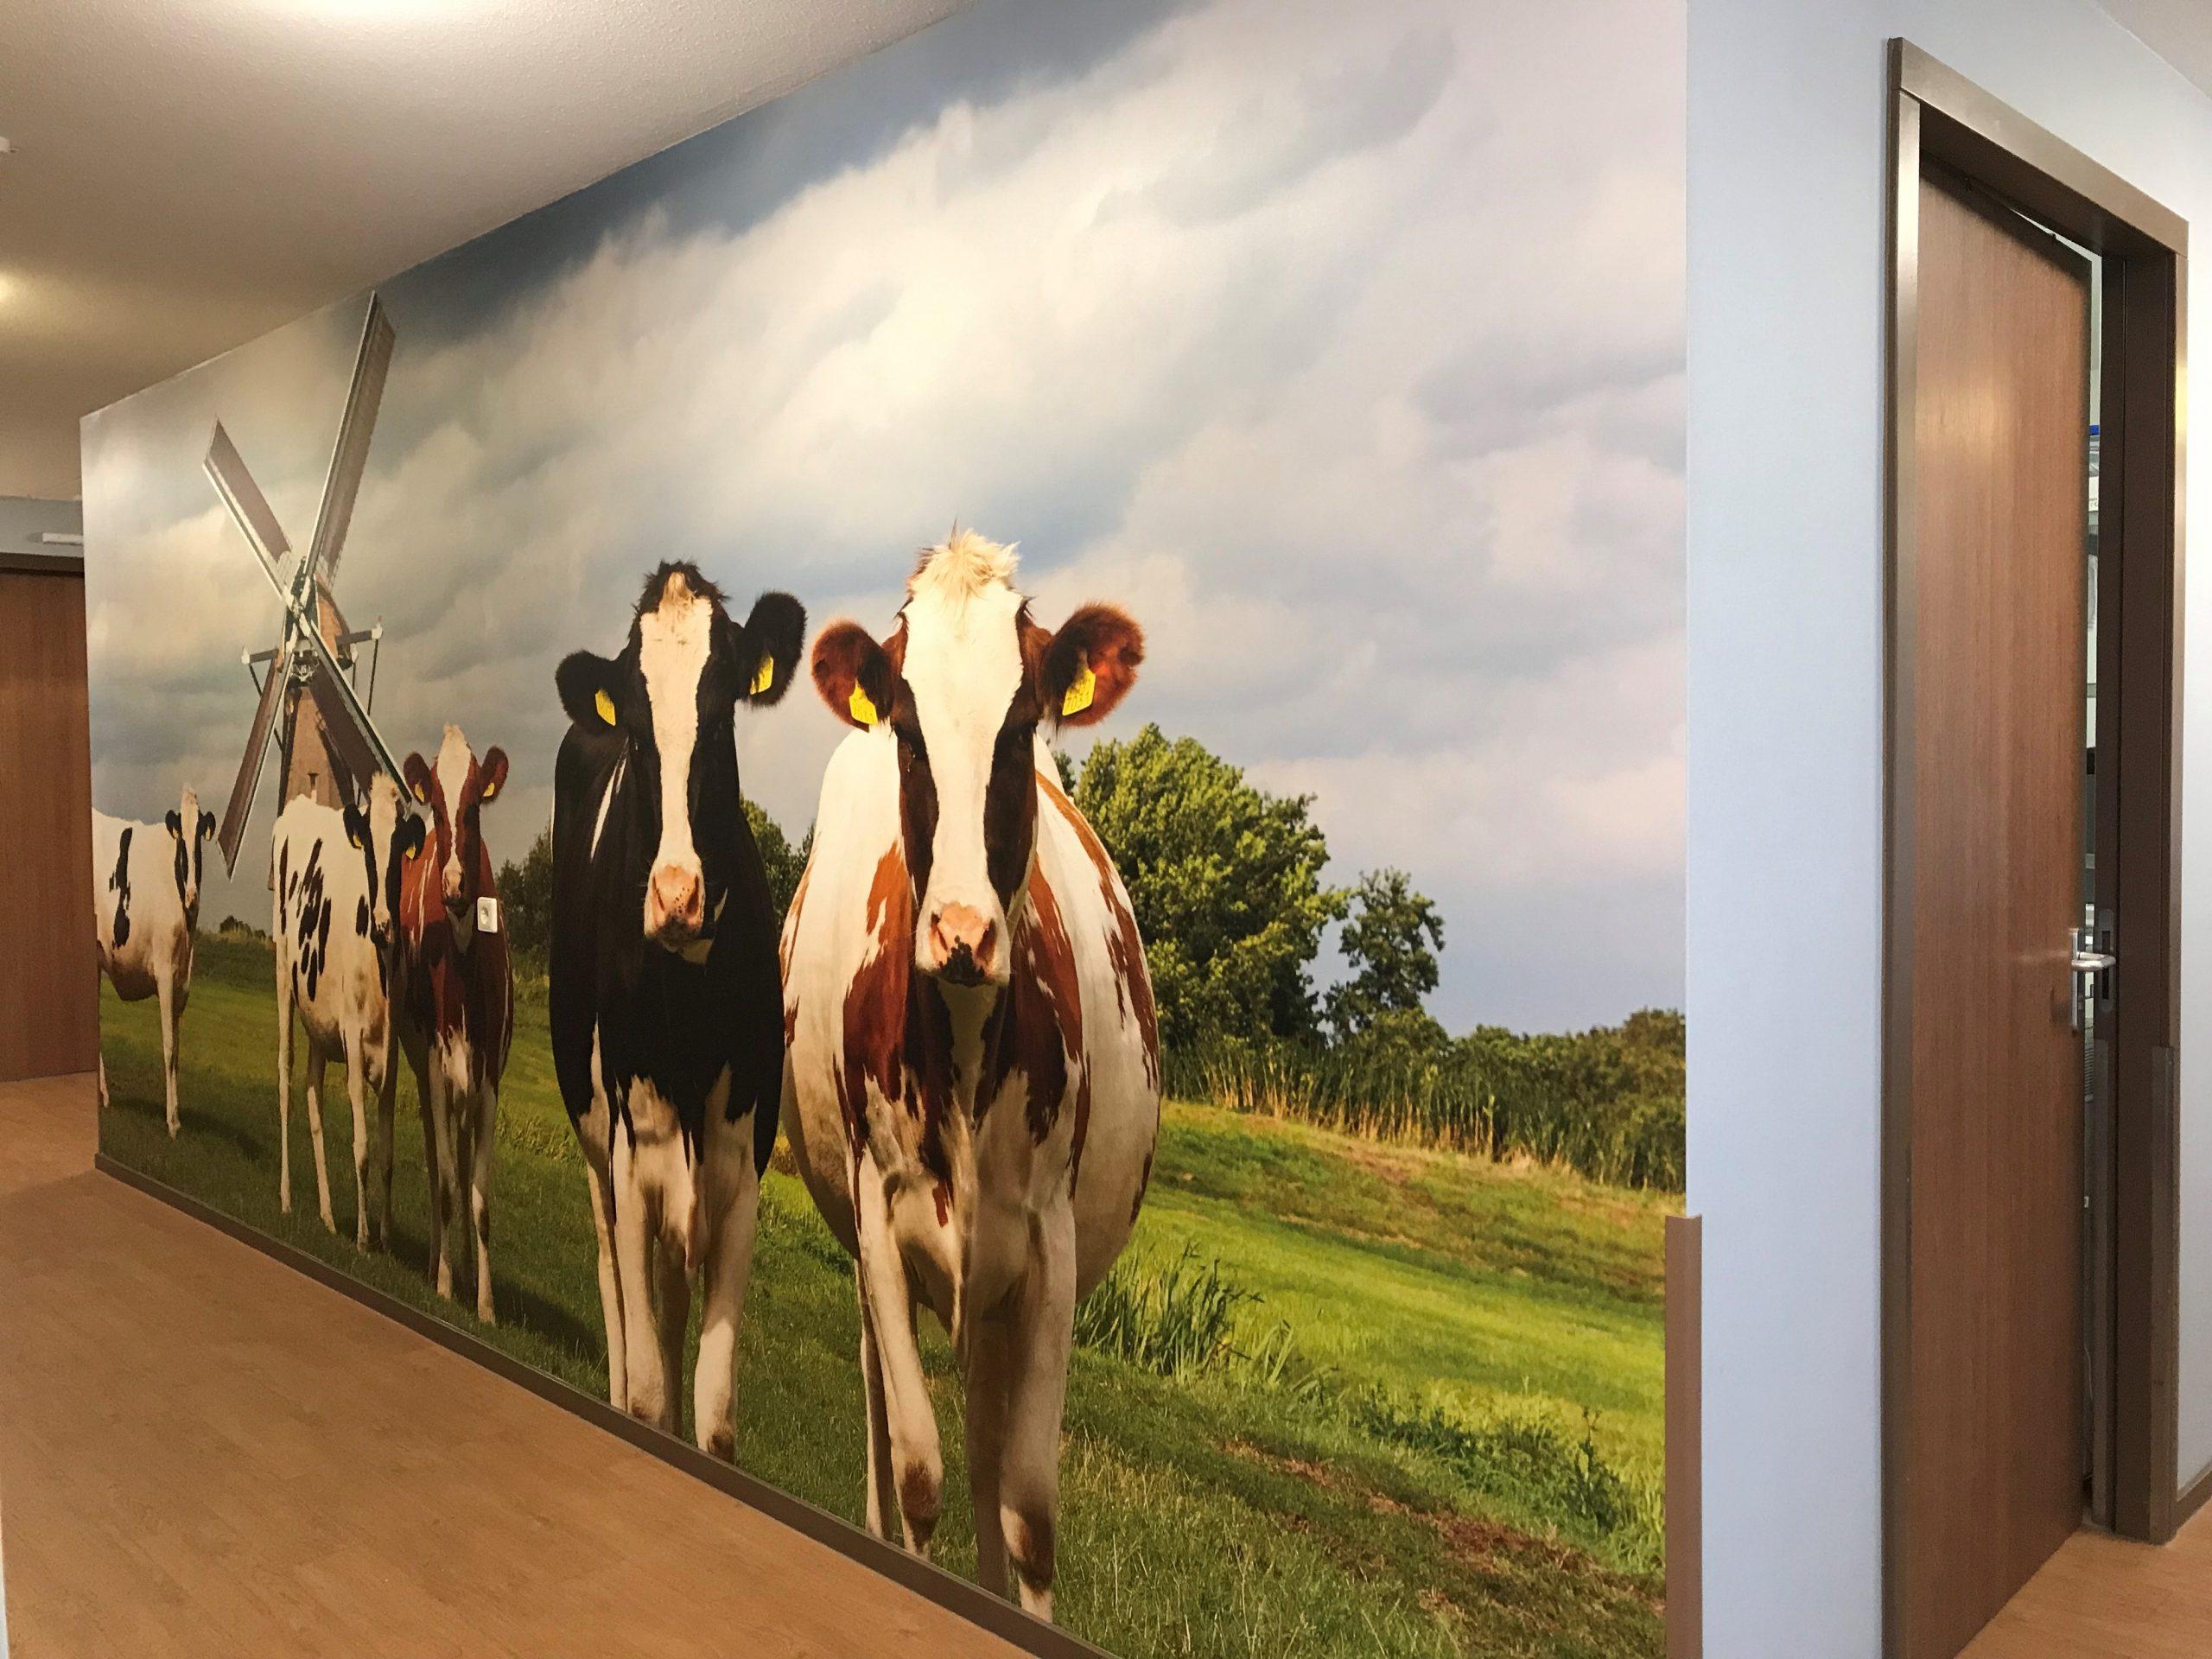 Fotobehang met koeien